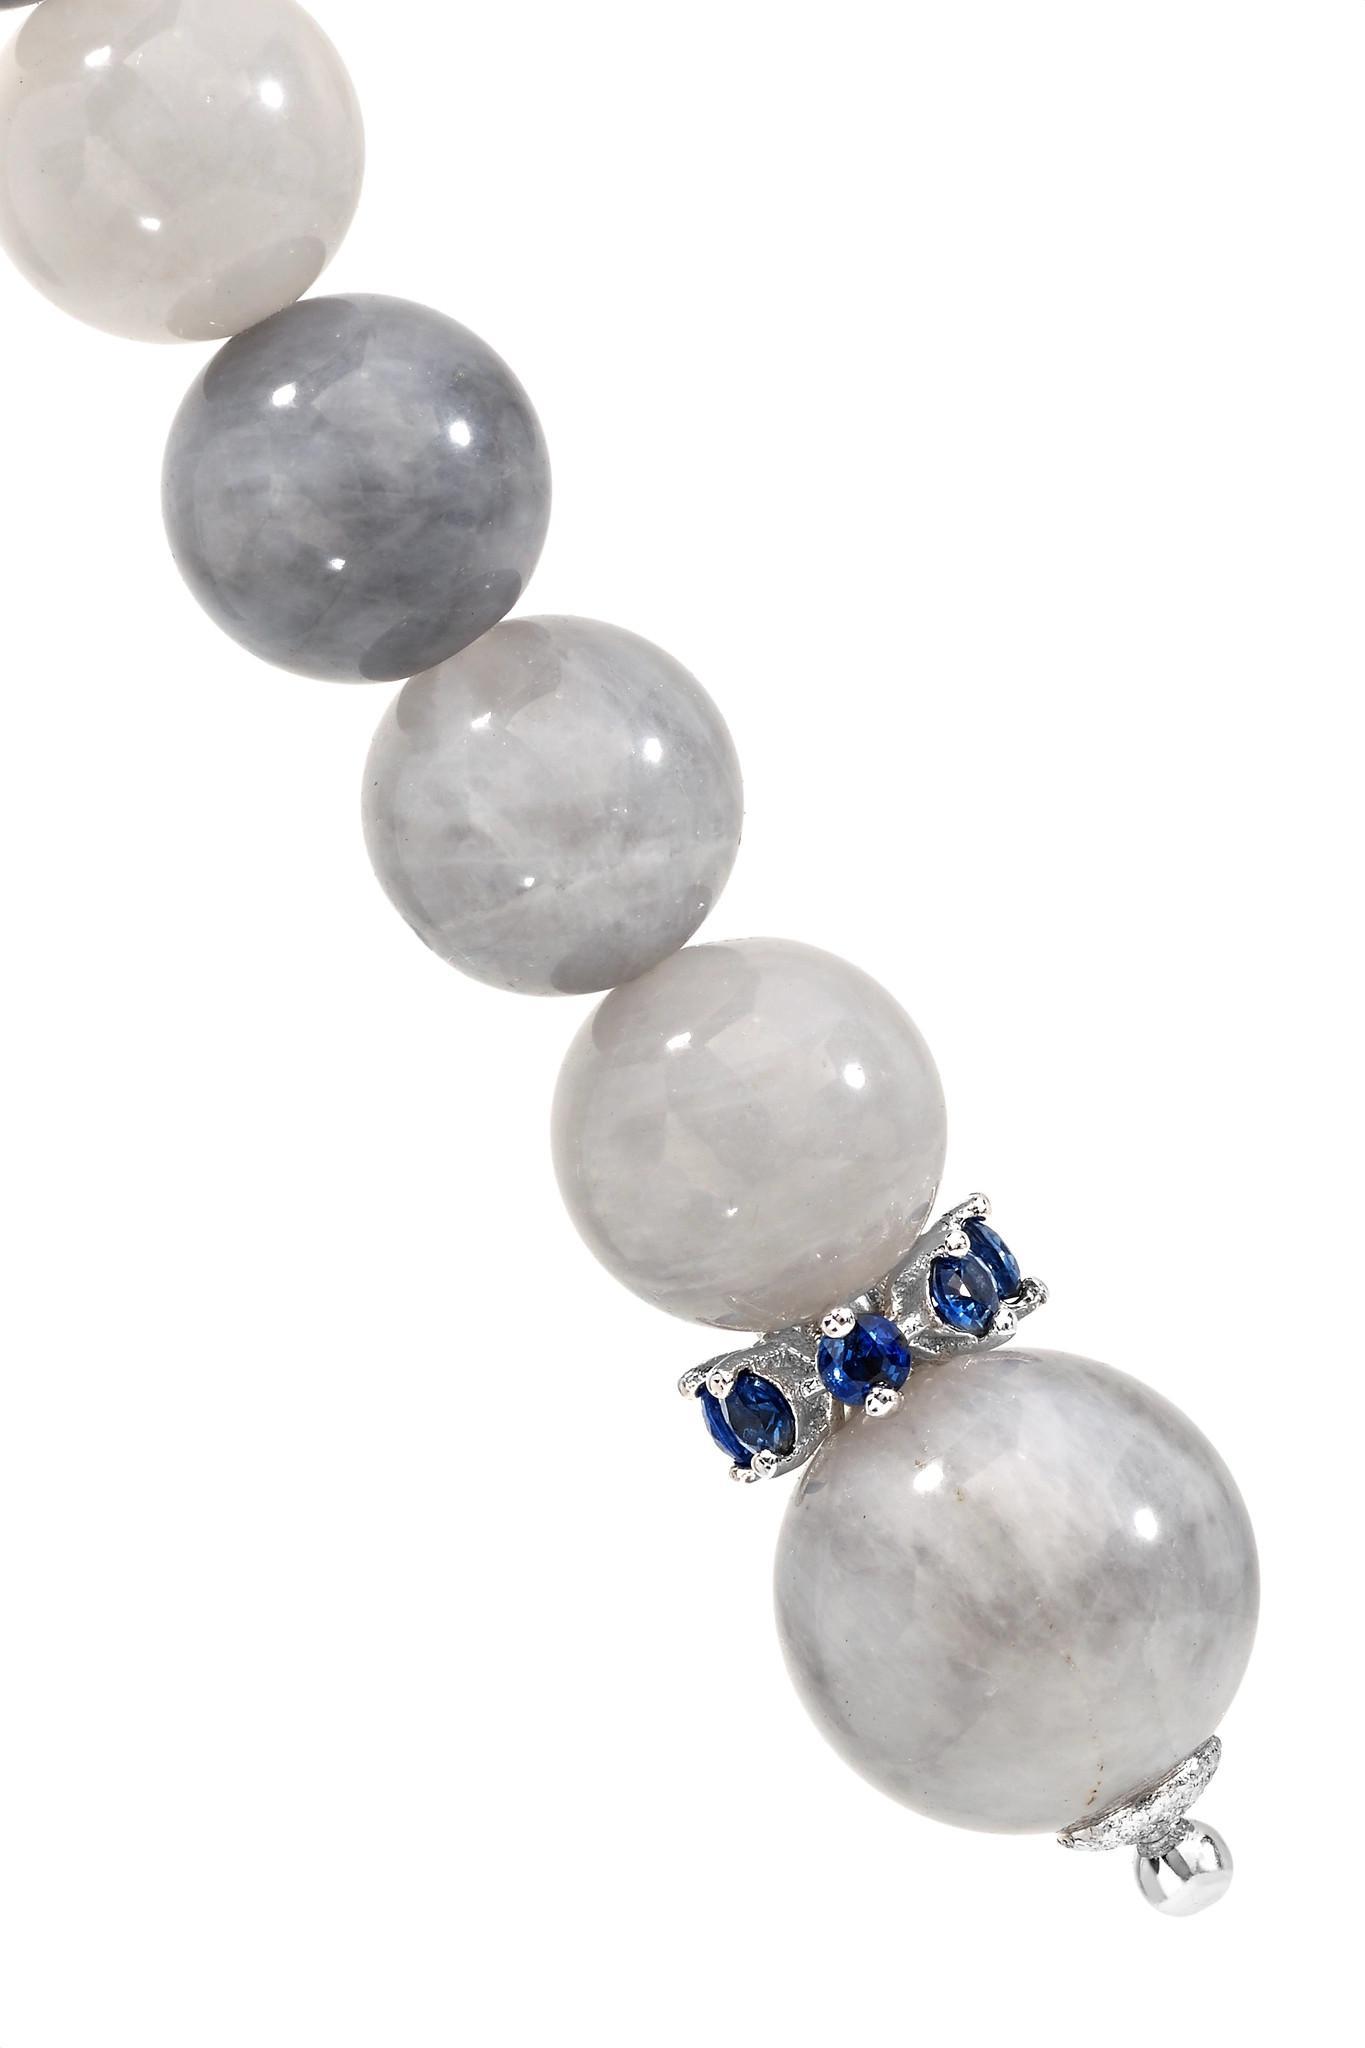 Recharmed 18-karat White Gold, Eagle Eye And Sapphire Earrings - one size Carolina Bucci